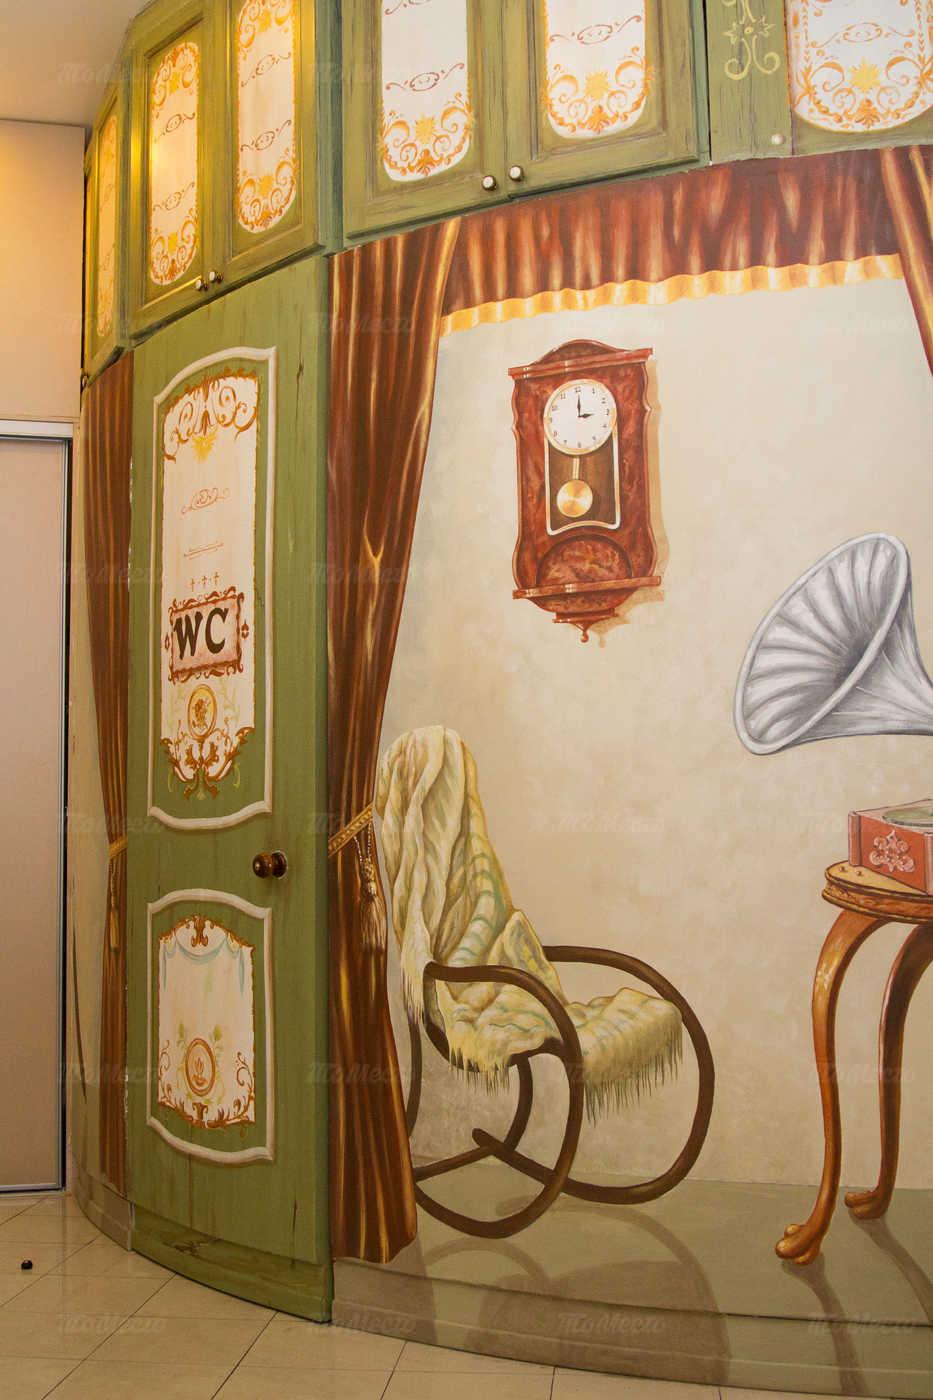 Меню ресторана, стейка-хауса Бефstroганов-гриль (бывш. Шуры-Муры) на улице Белинского